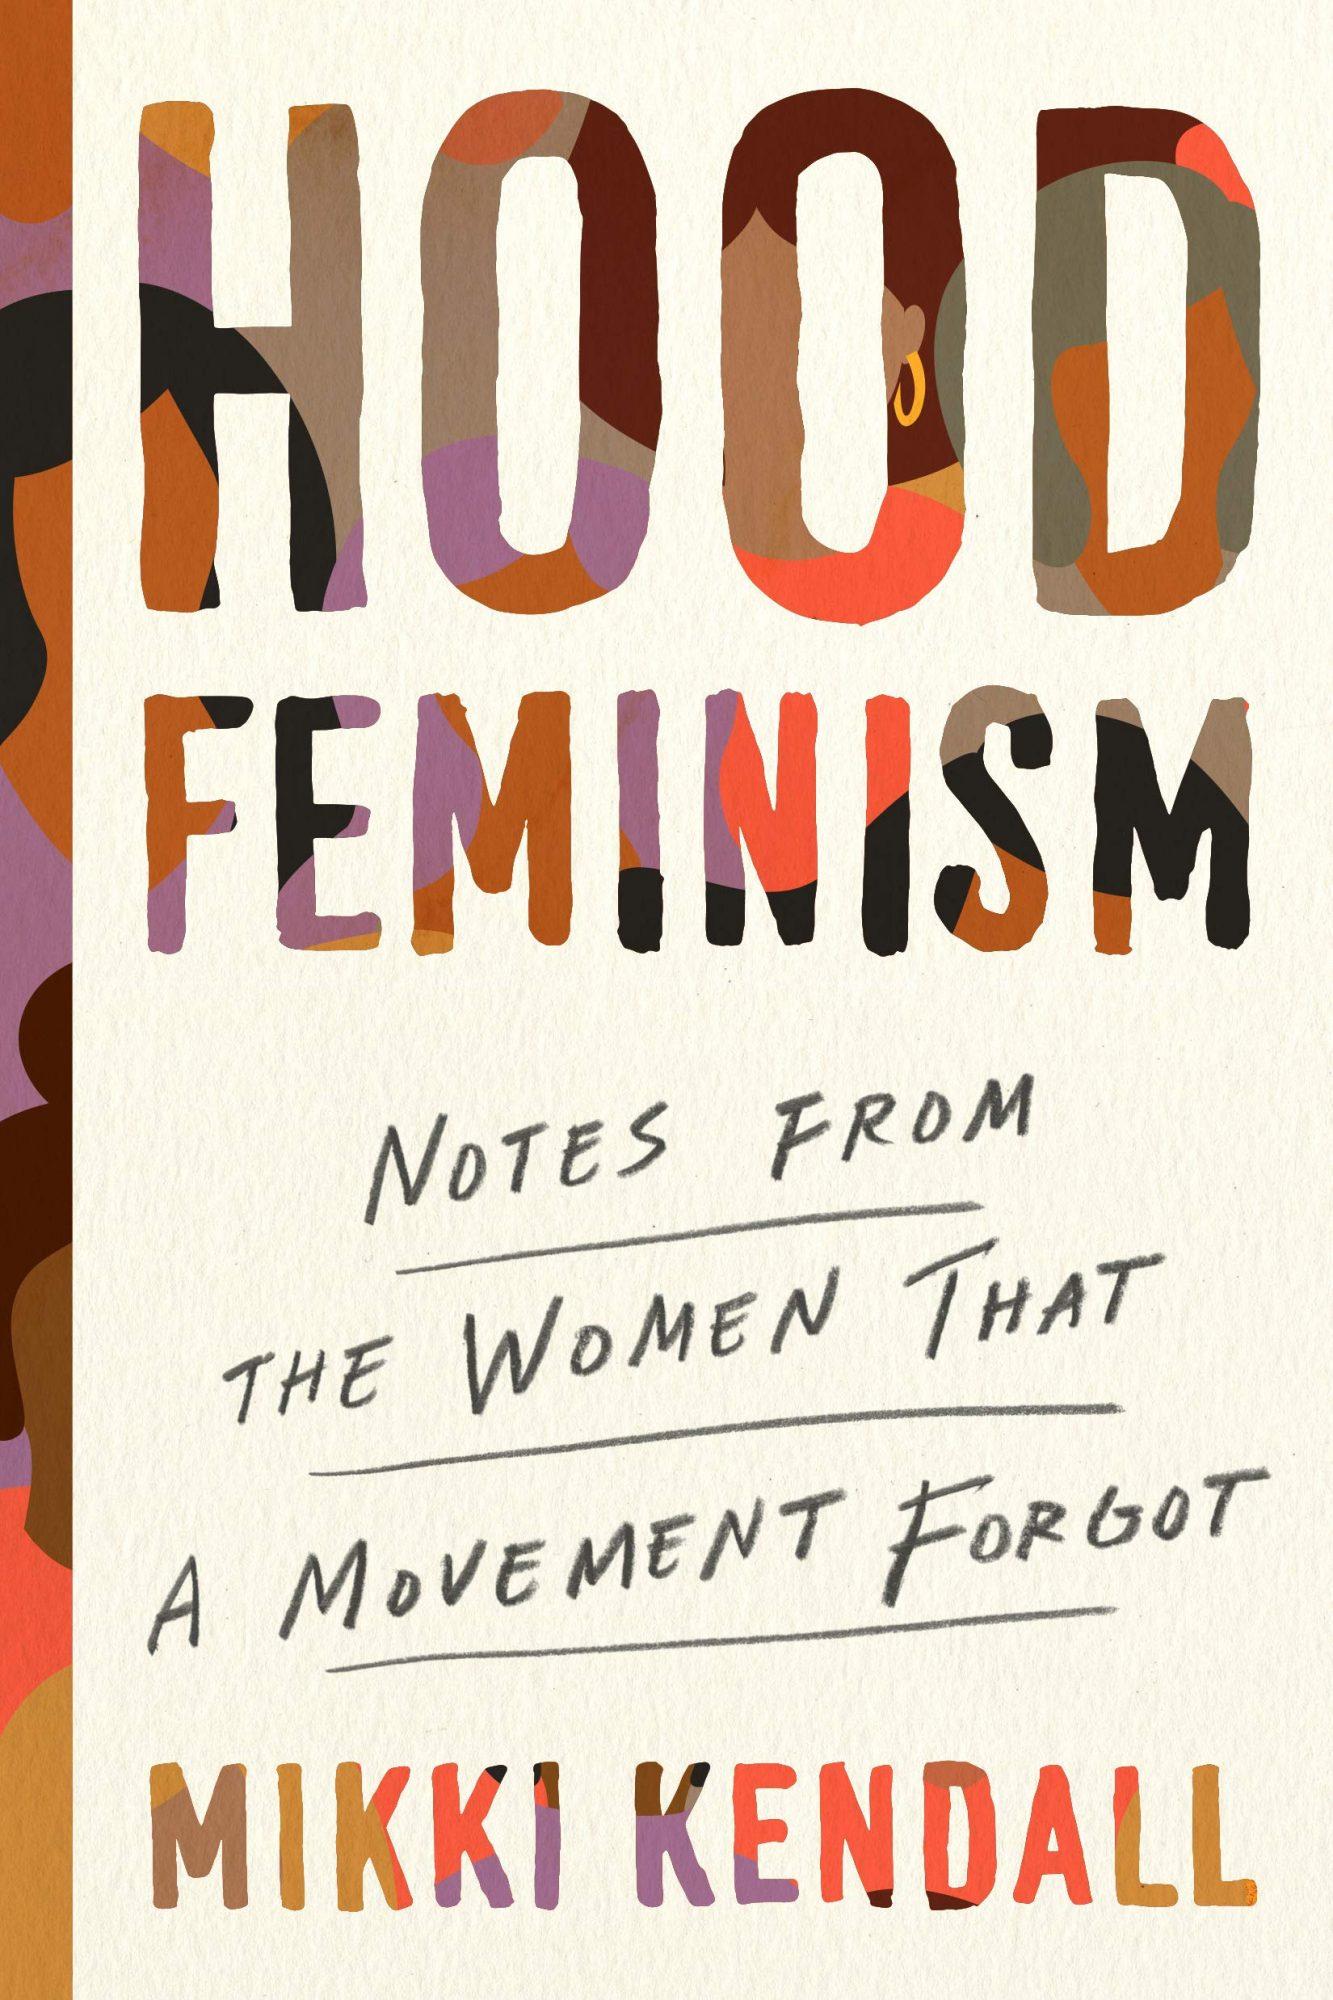 hood-feminism.jpg